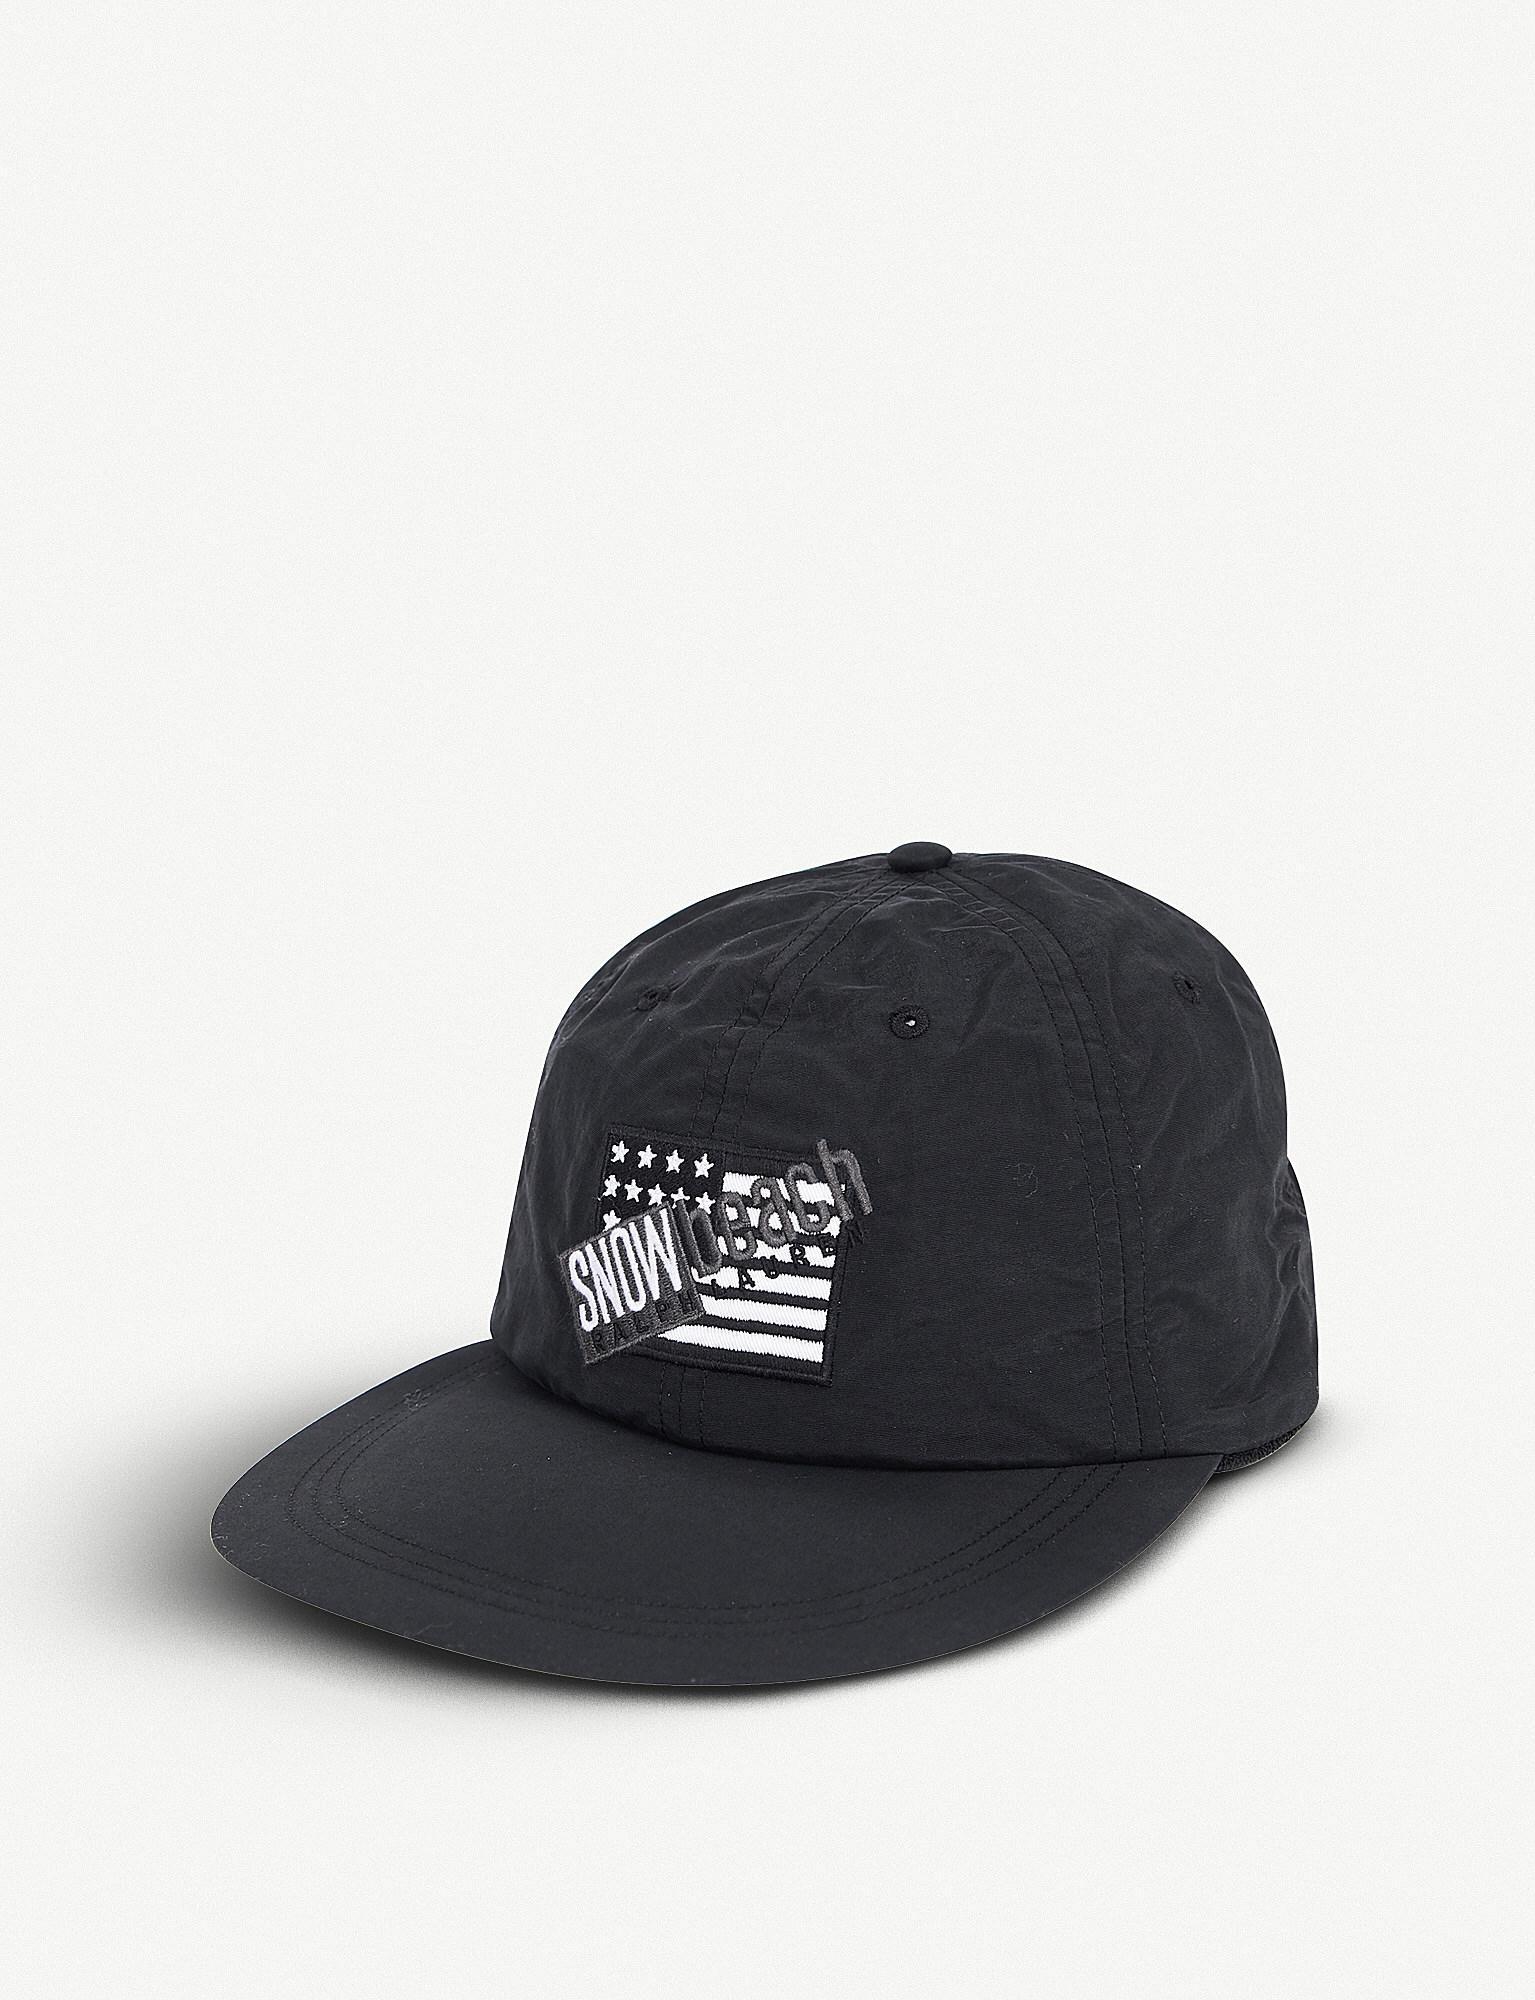 d29b270d7 Polo Ralph Lauren Snow Beach Fitted Cap in Black for Men - Lyst